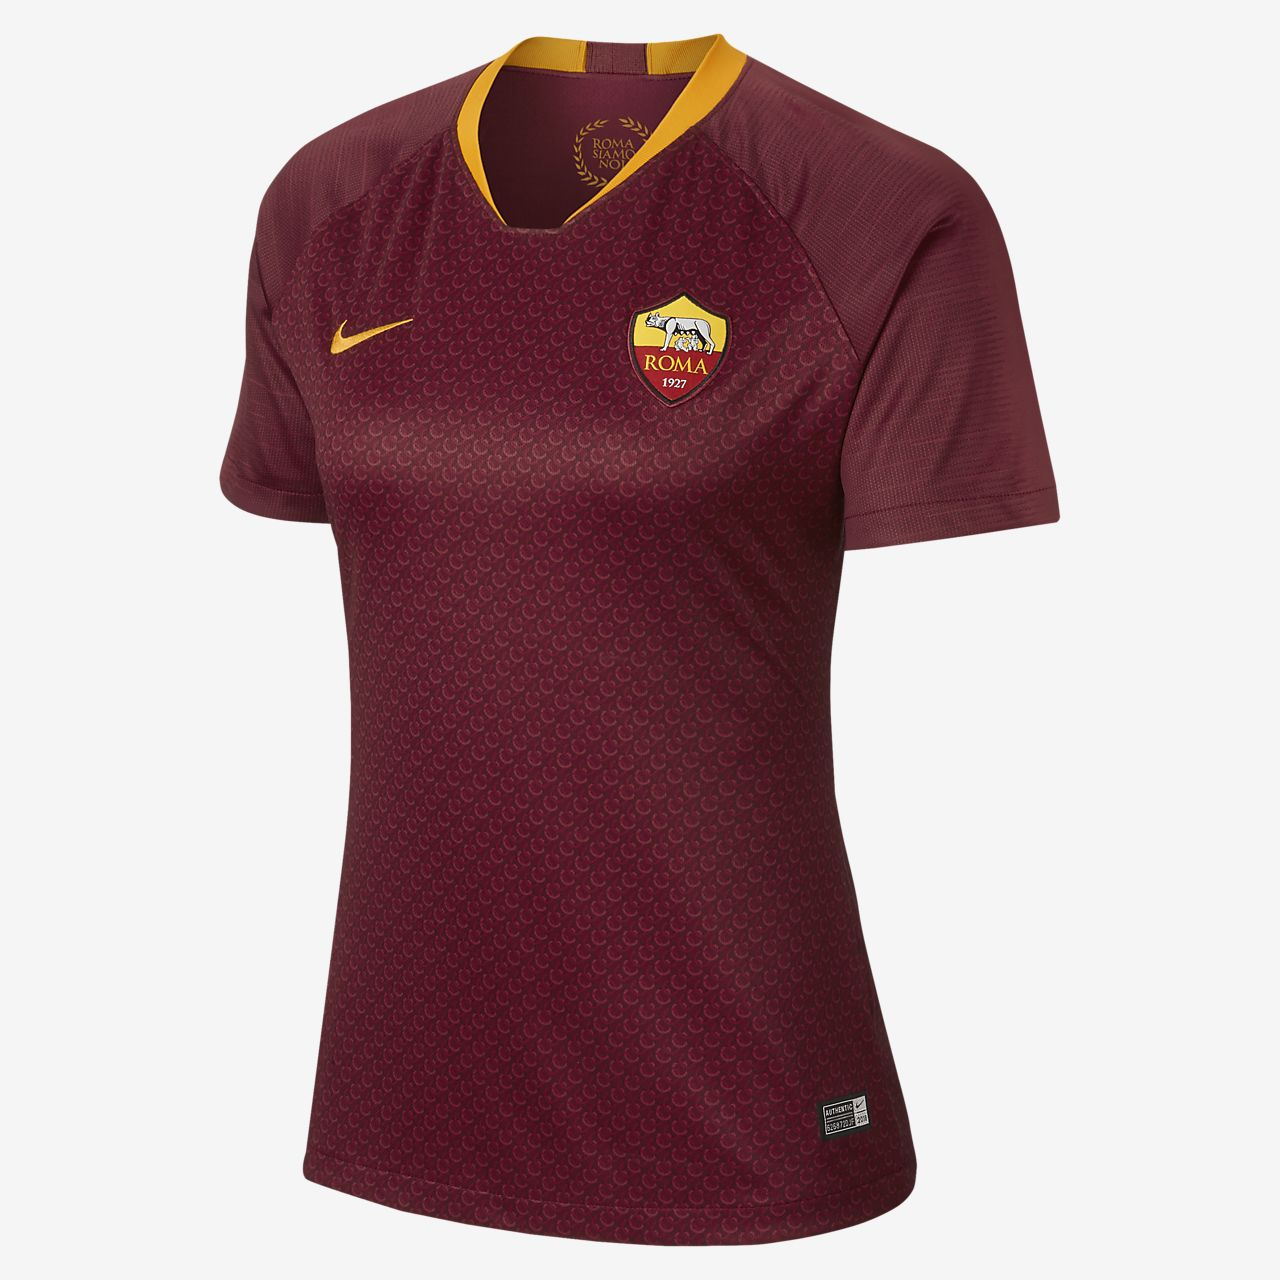 Maillot de football 2018/19 A.S. Roma Stadium Home pour Femme